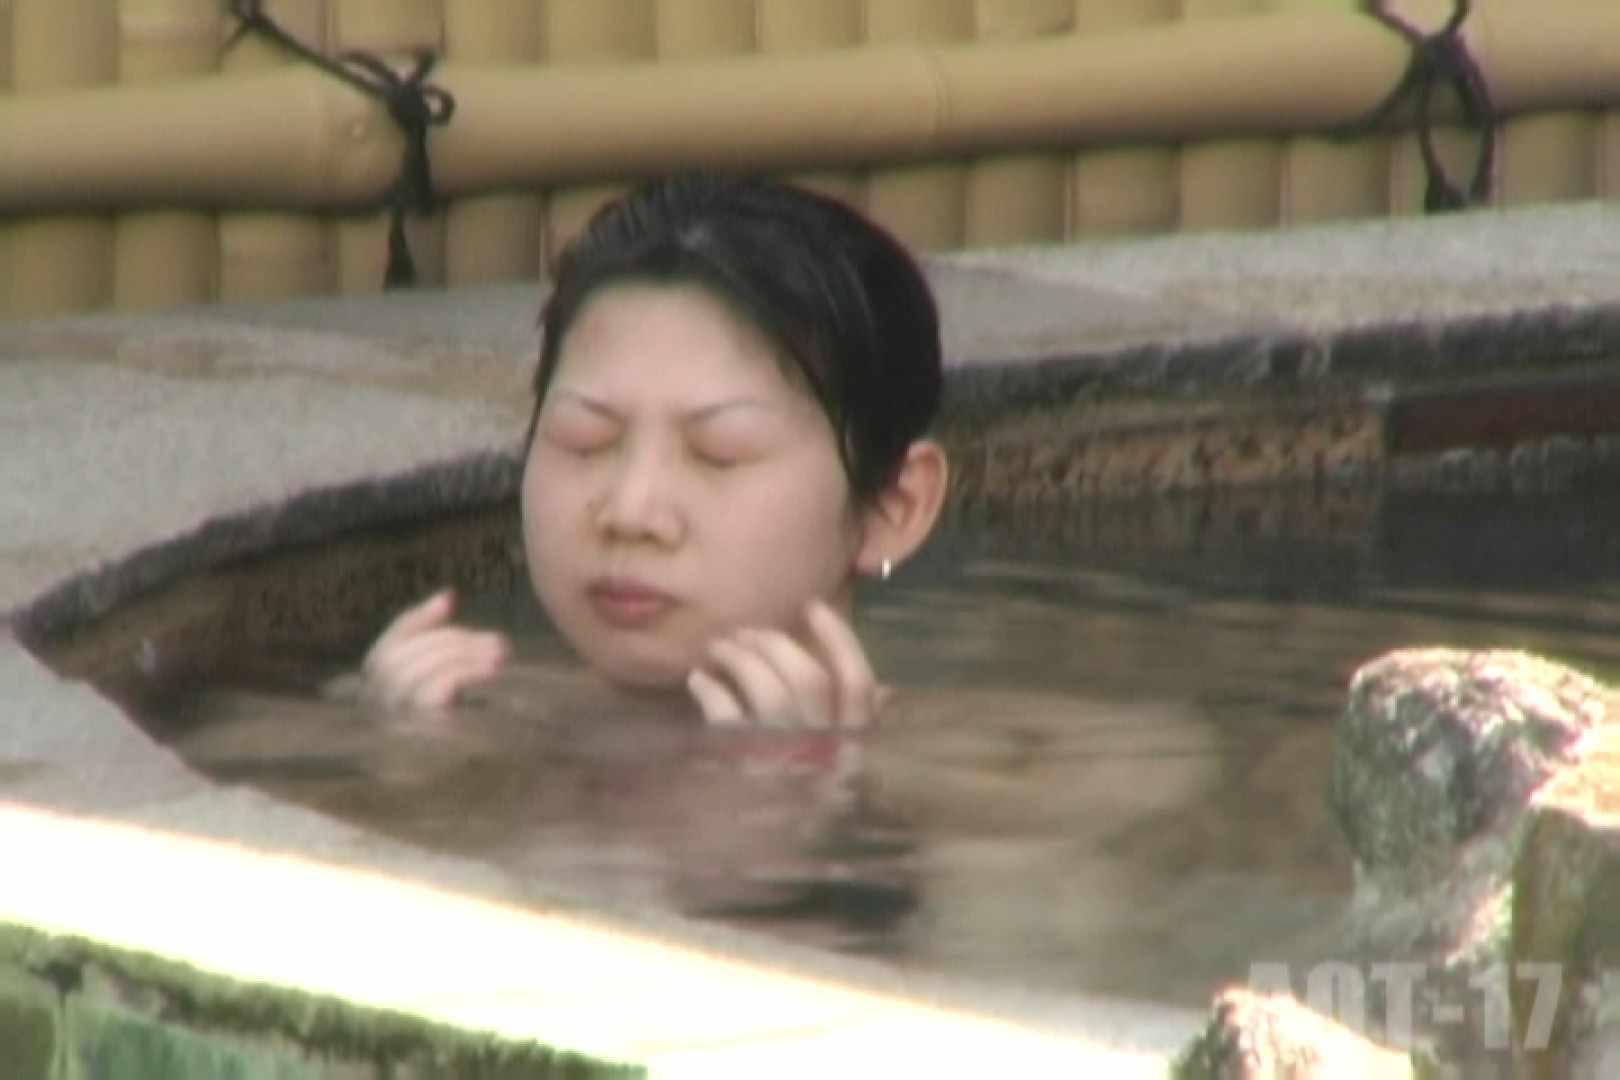 Aquaな露天風呂Vol.850 盗撮シリーズ | 露天風呂編  88PIX 7